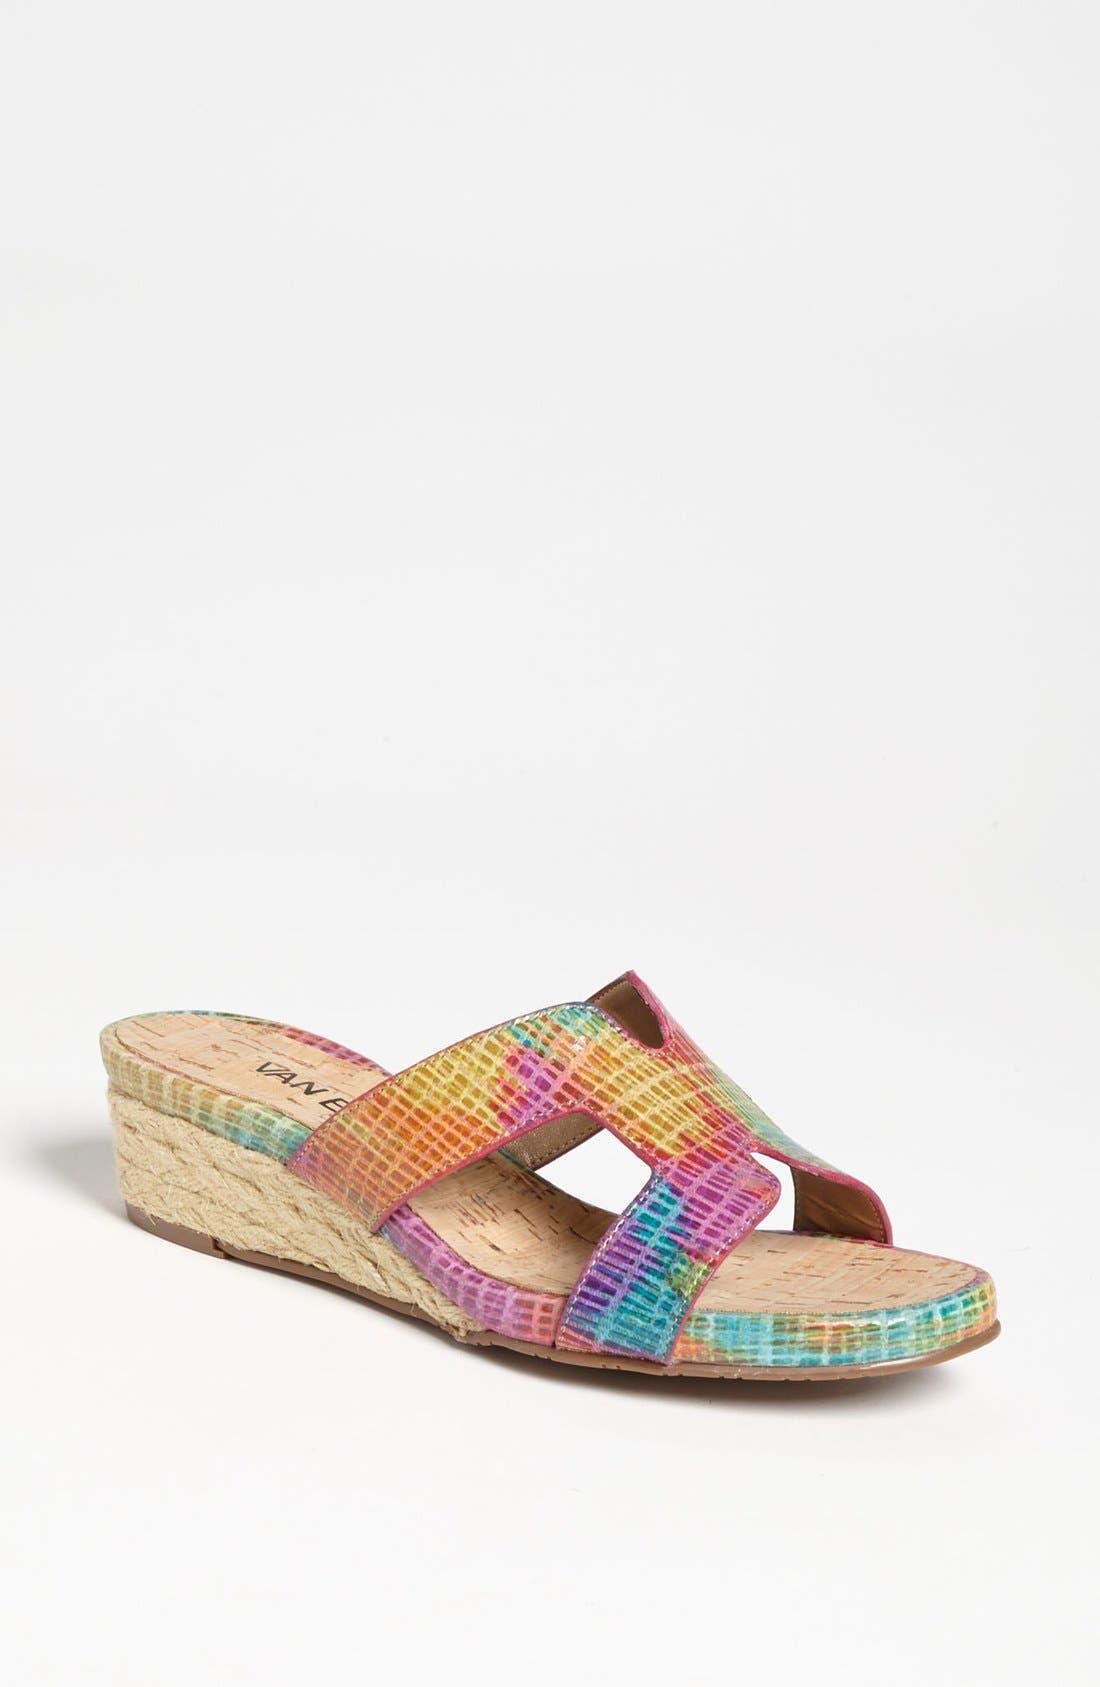 Alternate Image 1 Selected - VANELi 'Kallita' Sandal